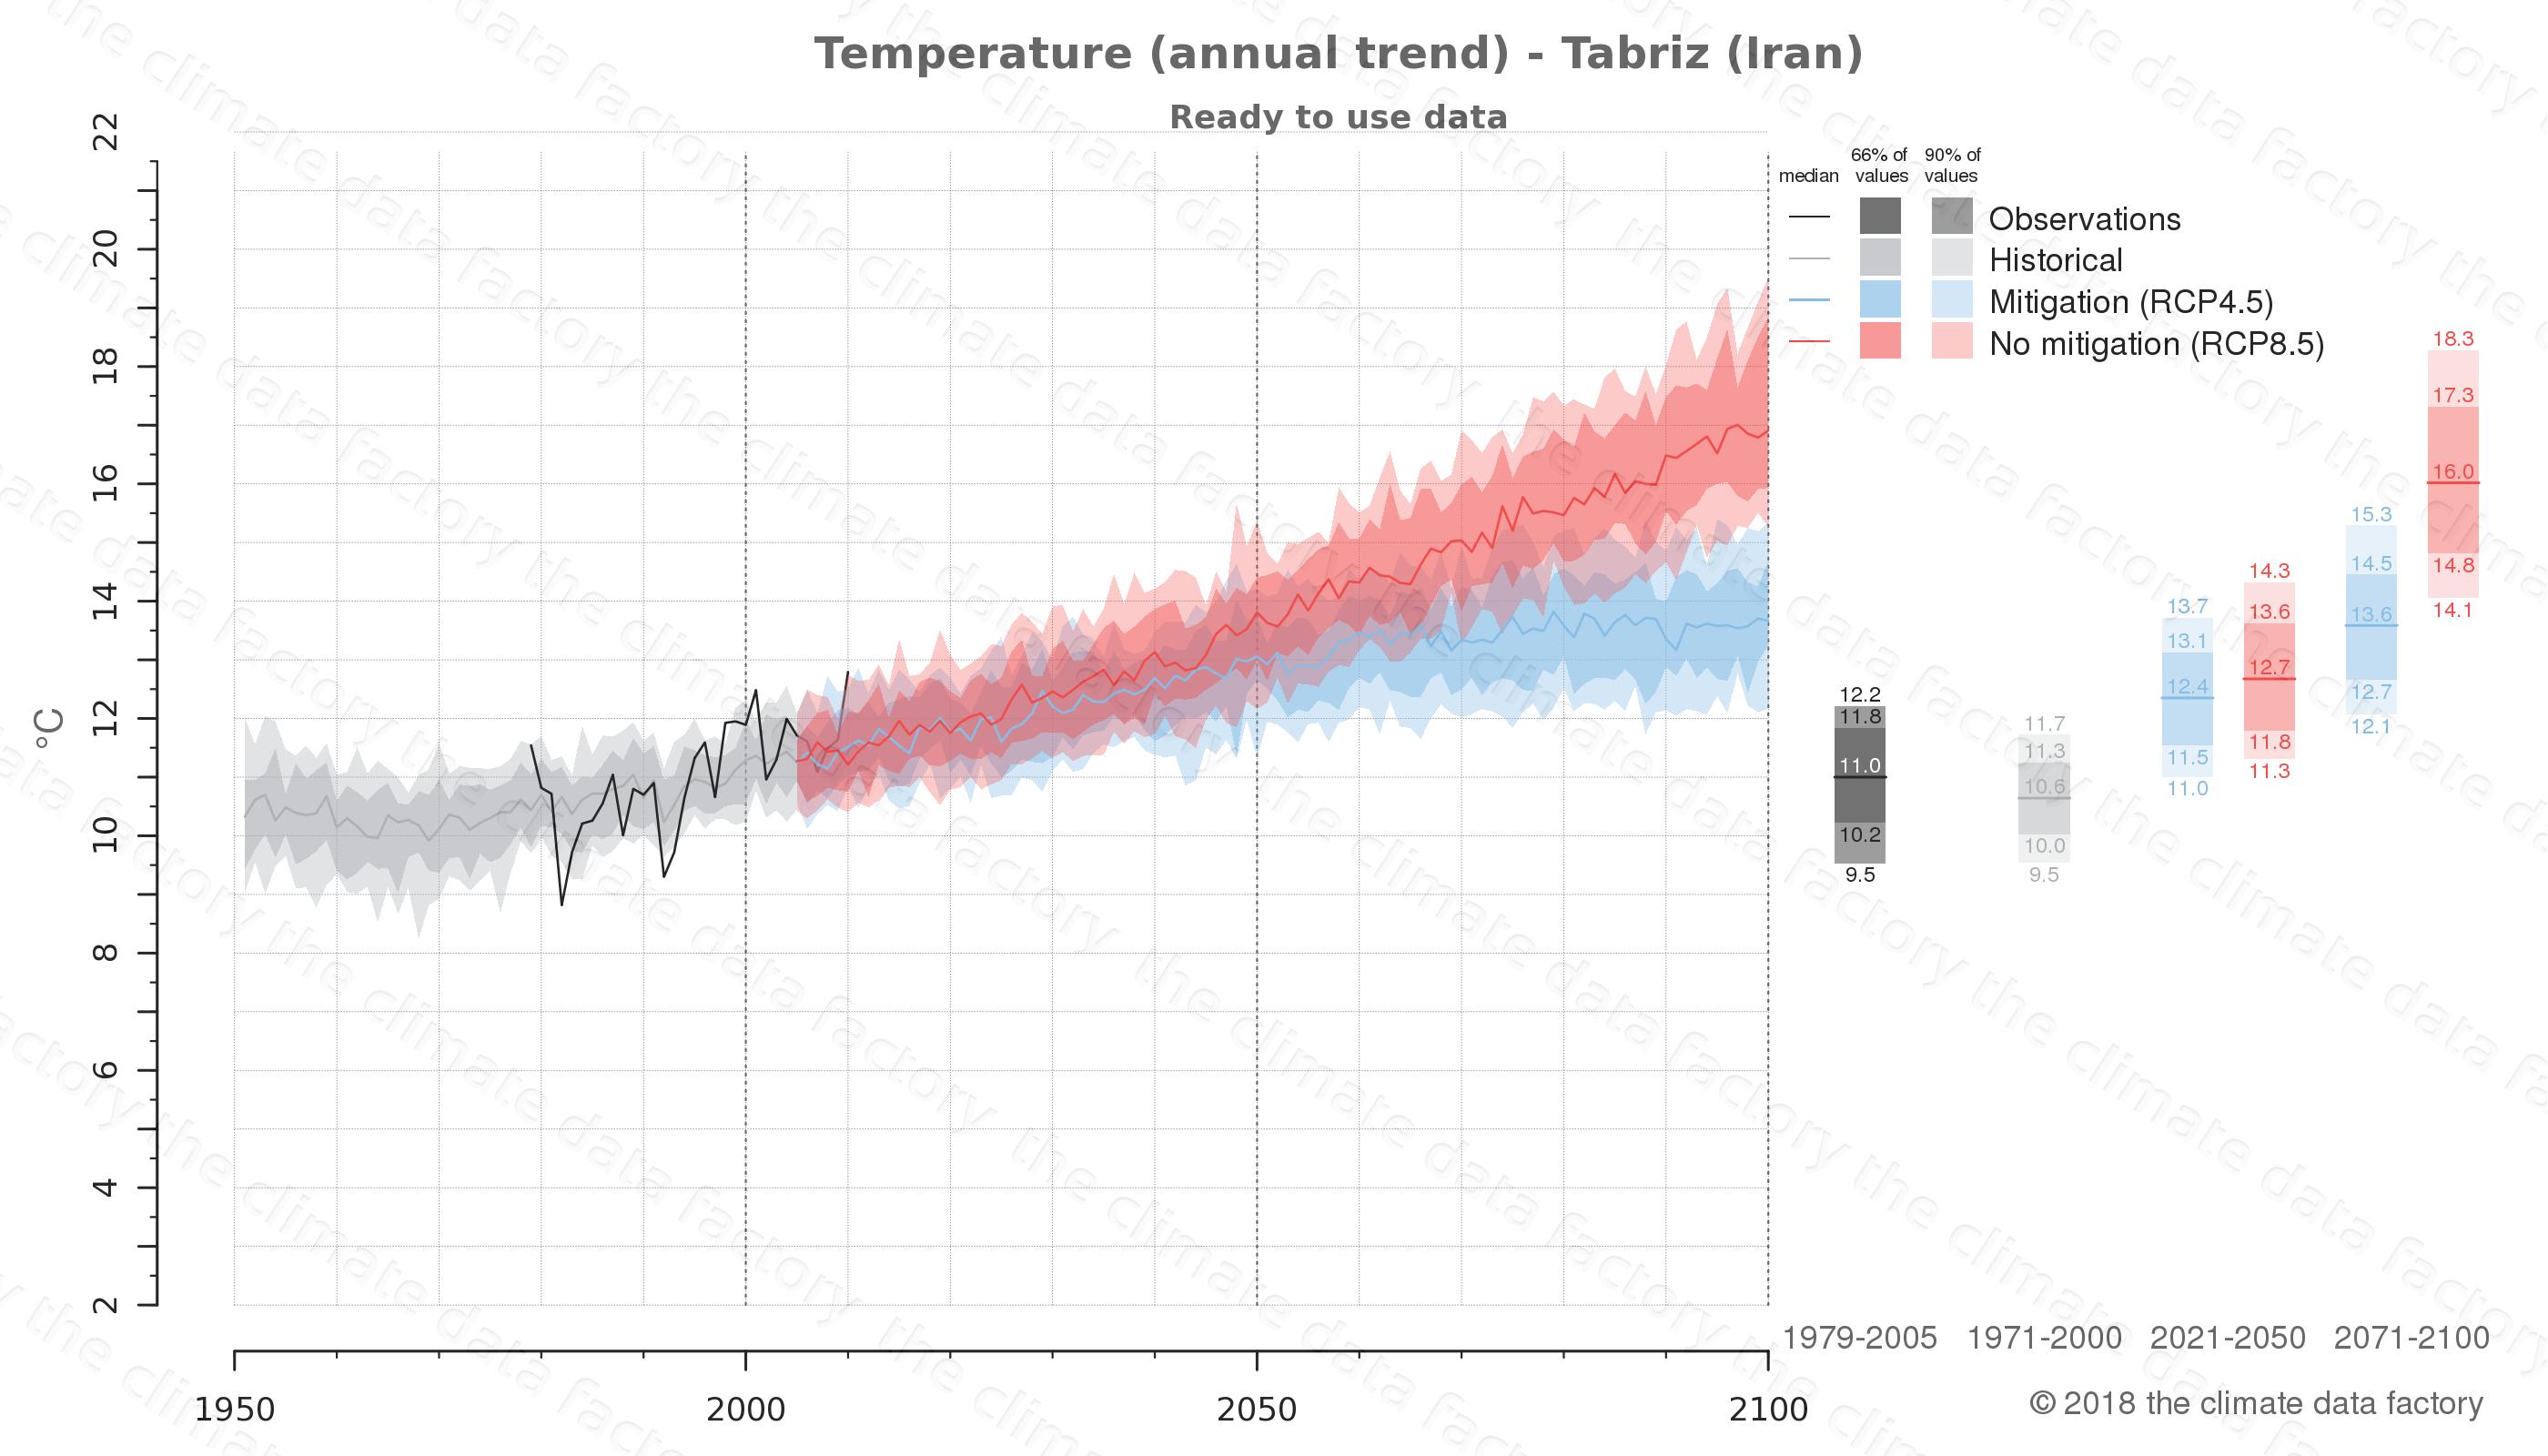 climate change data policy adaptation climate graph city data temperature tabriz iran